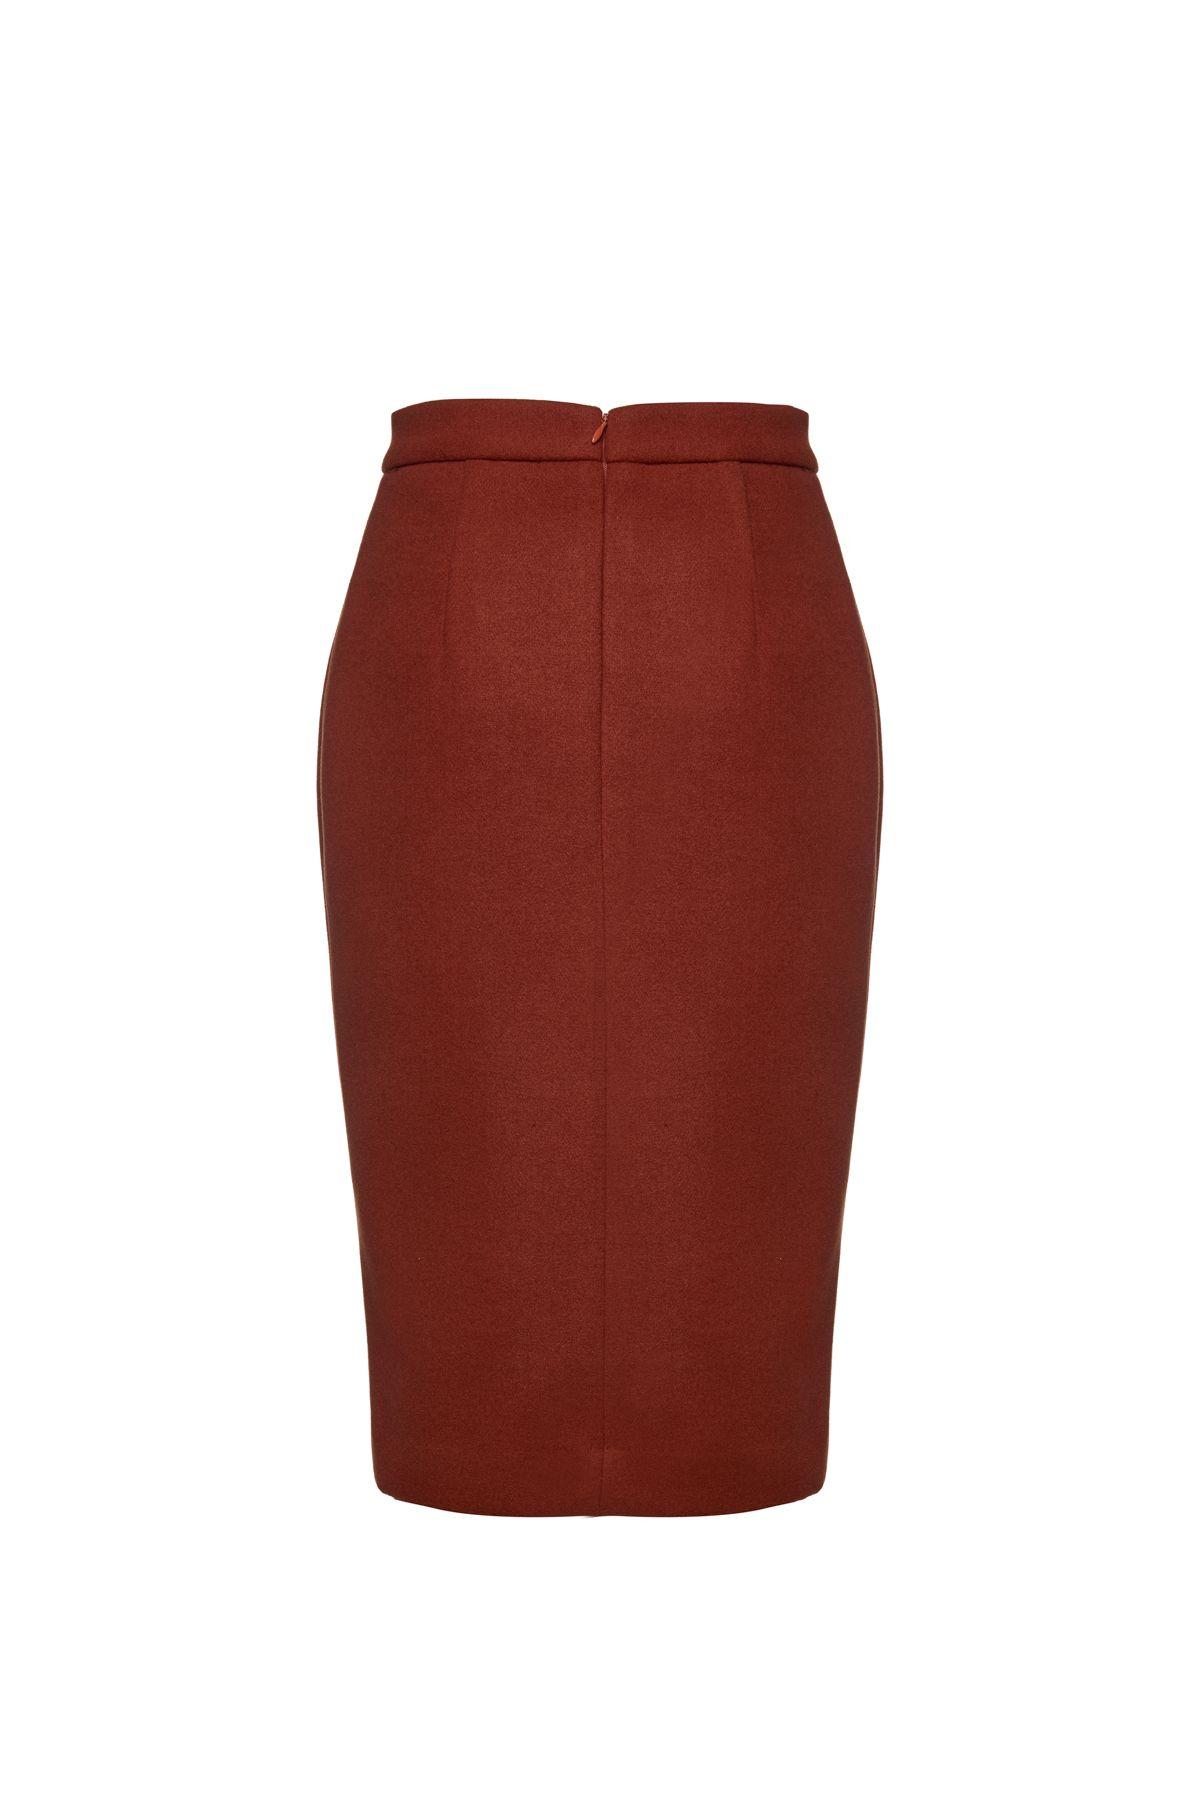 Brick Red Mouflon Pencil Skirt